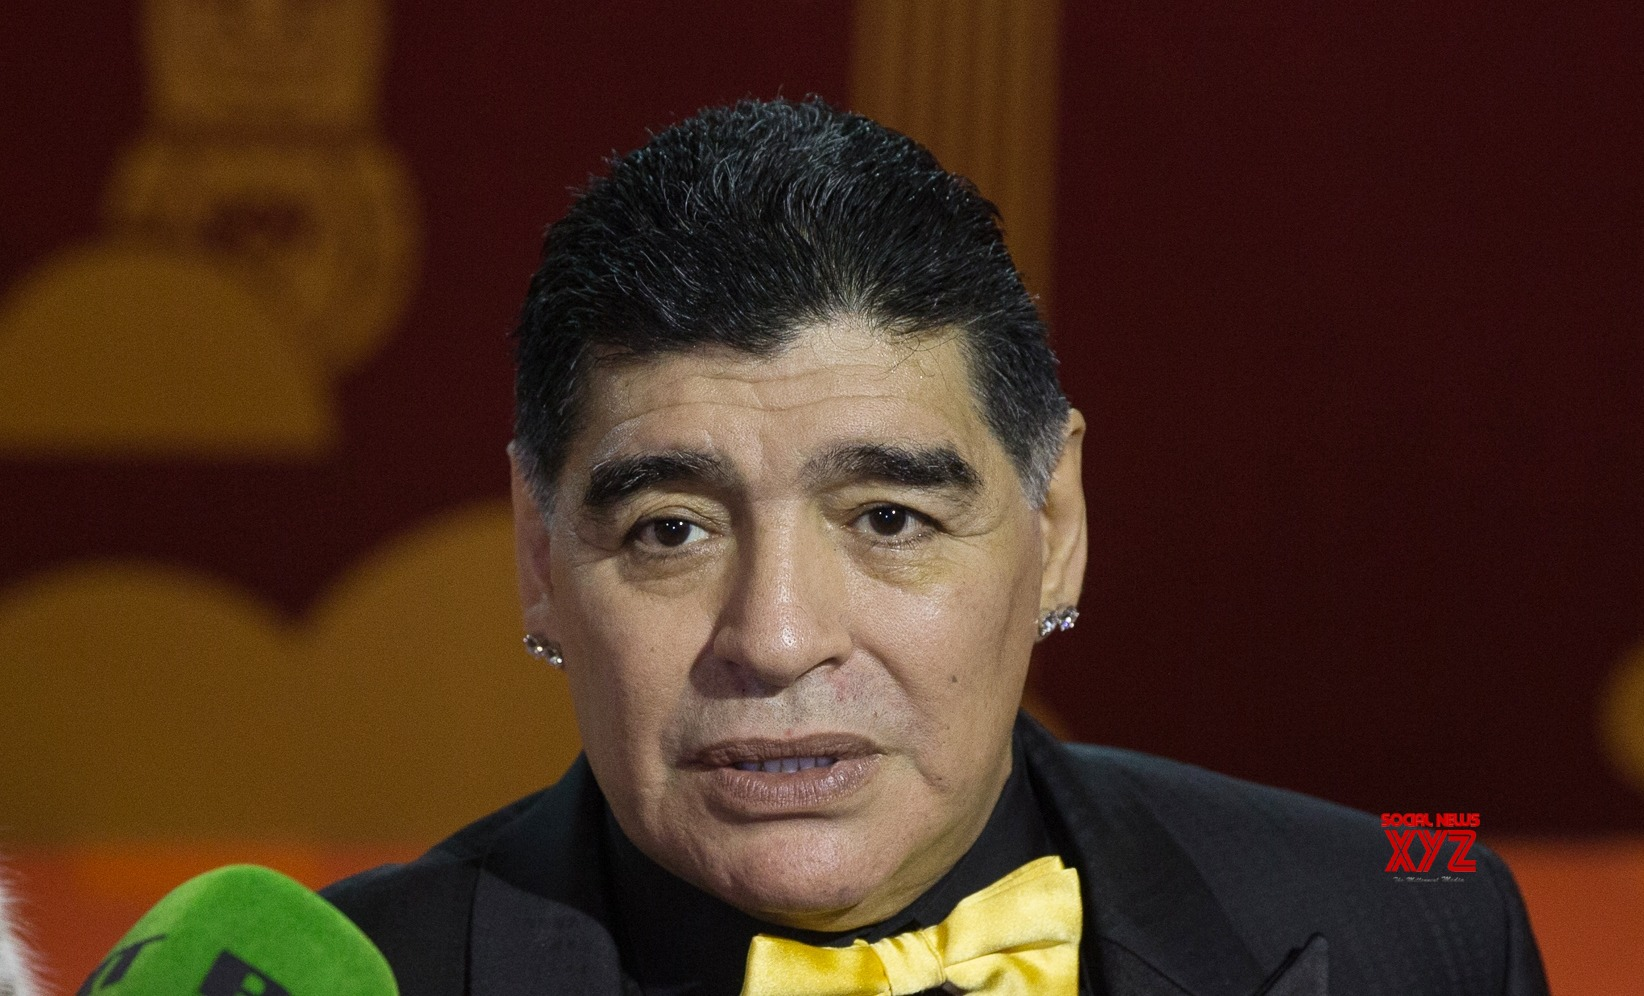 Maradona case a 'trial by media', says lawyer